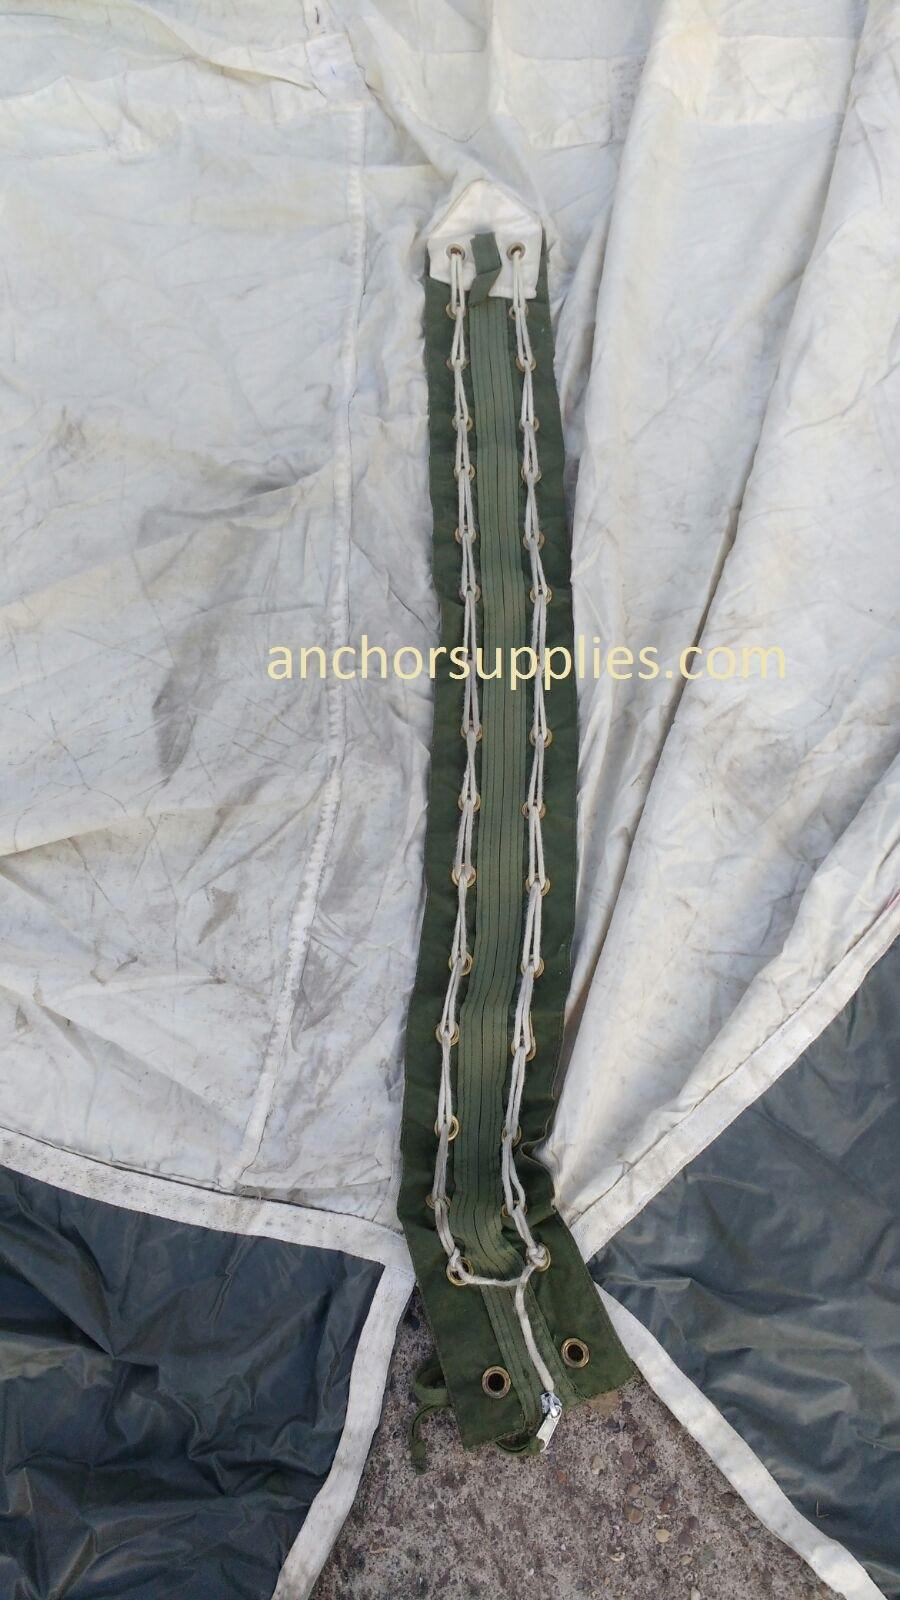 Ex British Army 10 Man Arctic Bell Tent Liner - B Grade & Ex British Army 10 Man Arctic Bell Tent Liner - A Grade